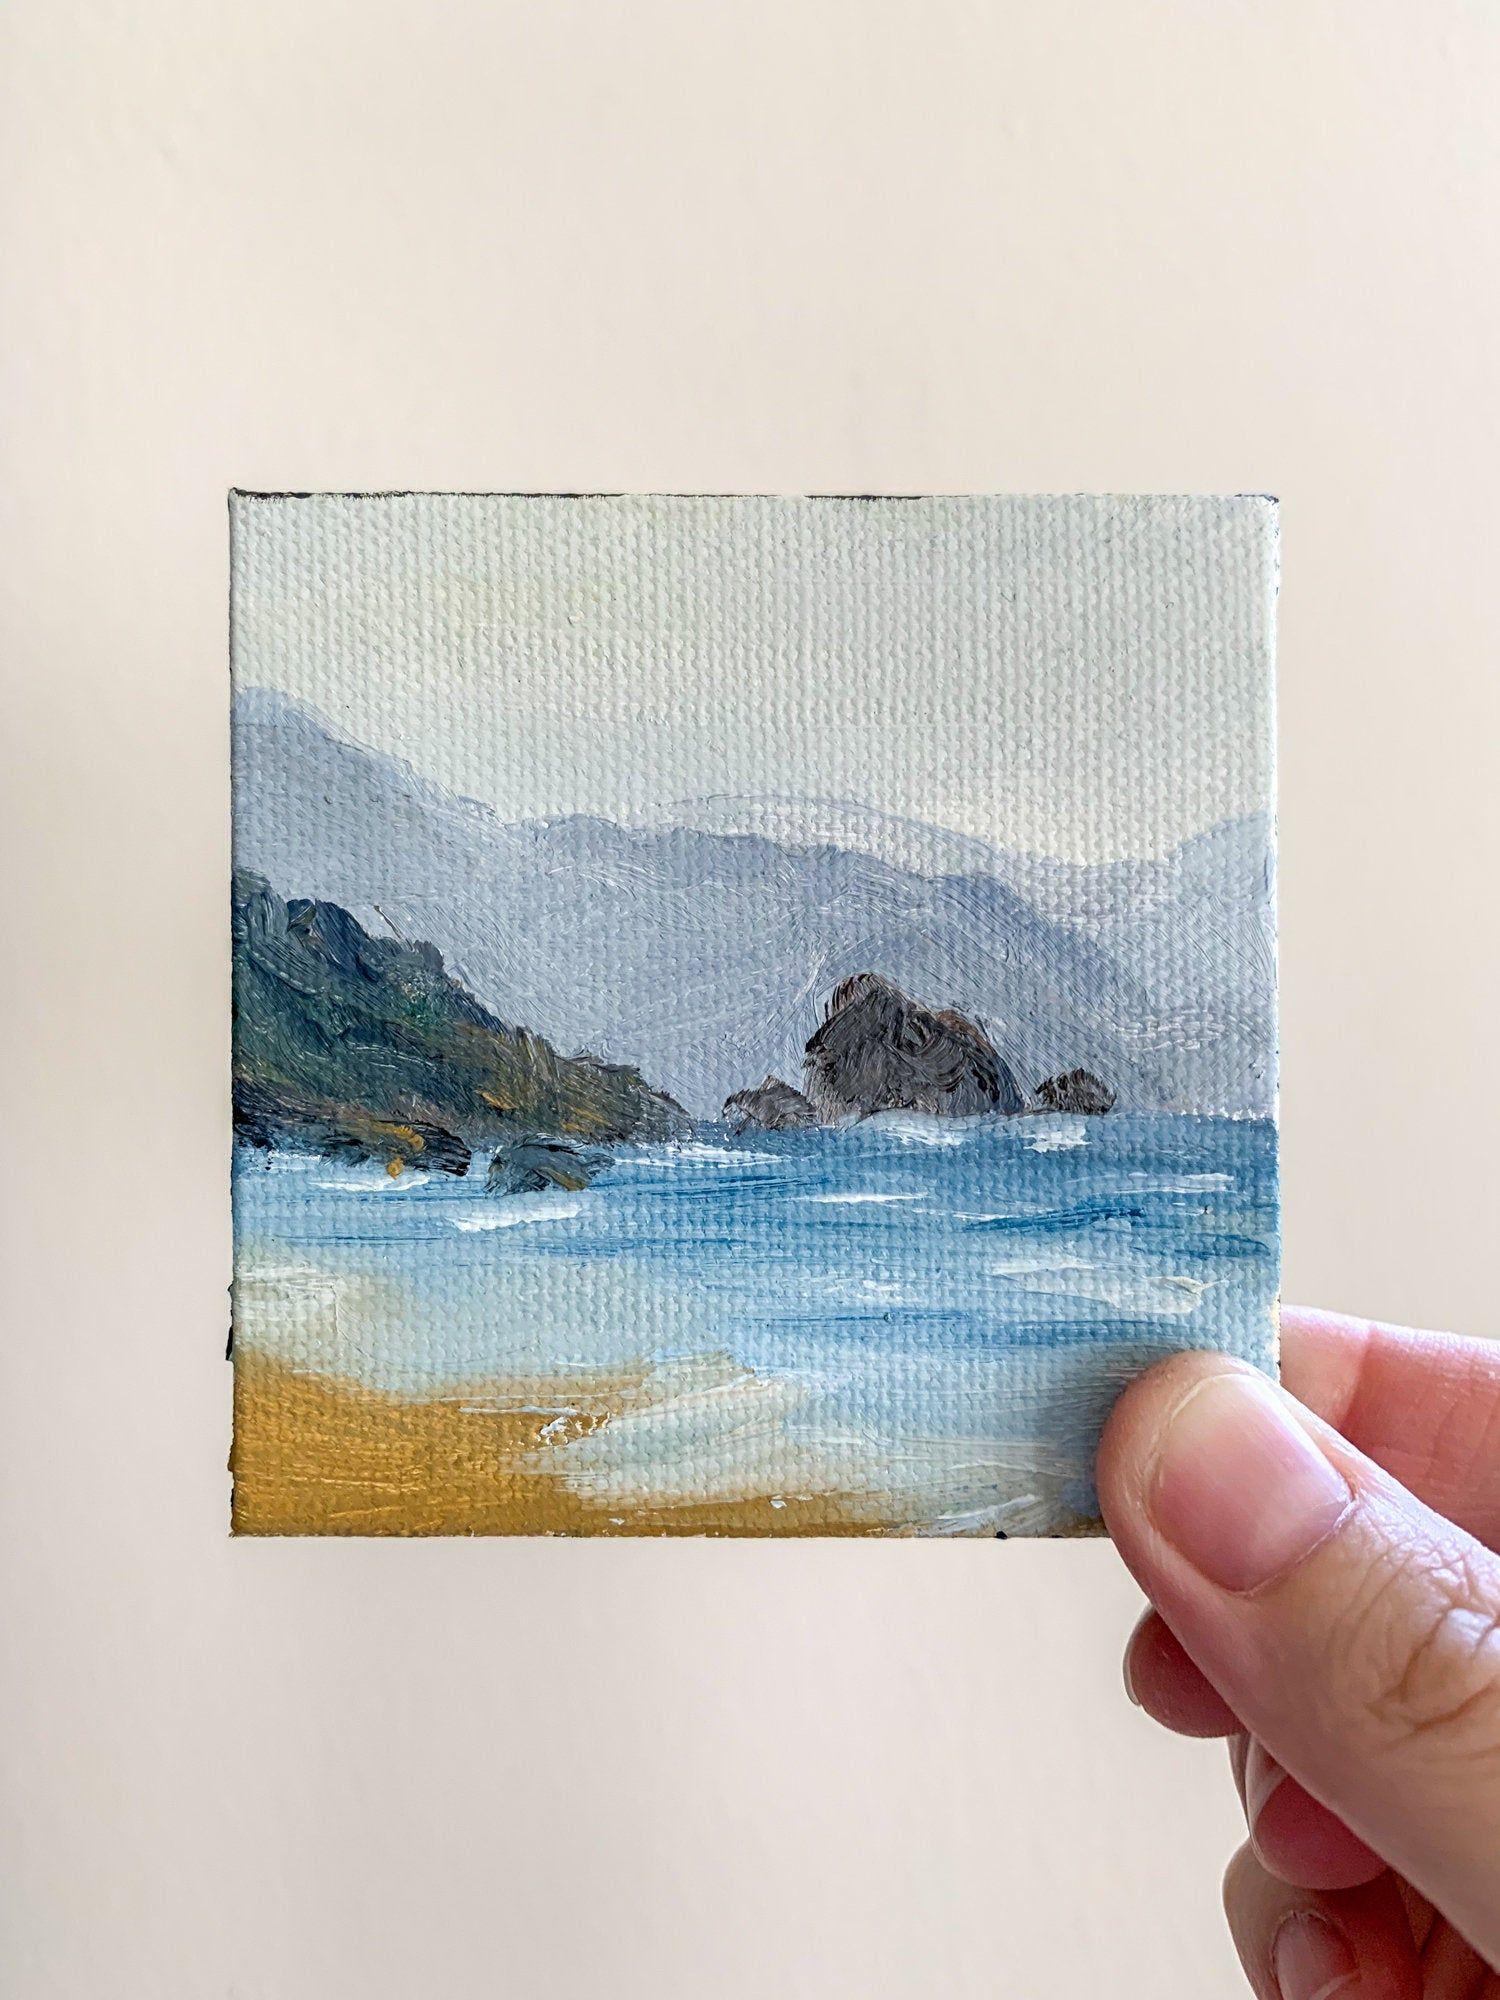 Mini Oregon Landscape Painting Coastal Art Ocean Waves Decor 3x3 Tiny Oil On Canvas Affordable Gifts Under 20 Mini Canvas Art Small Canvas Art Small Canvas Paintings